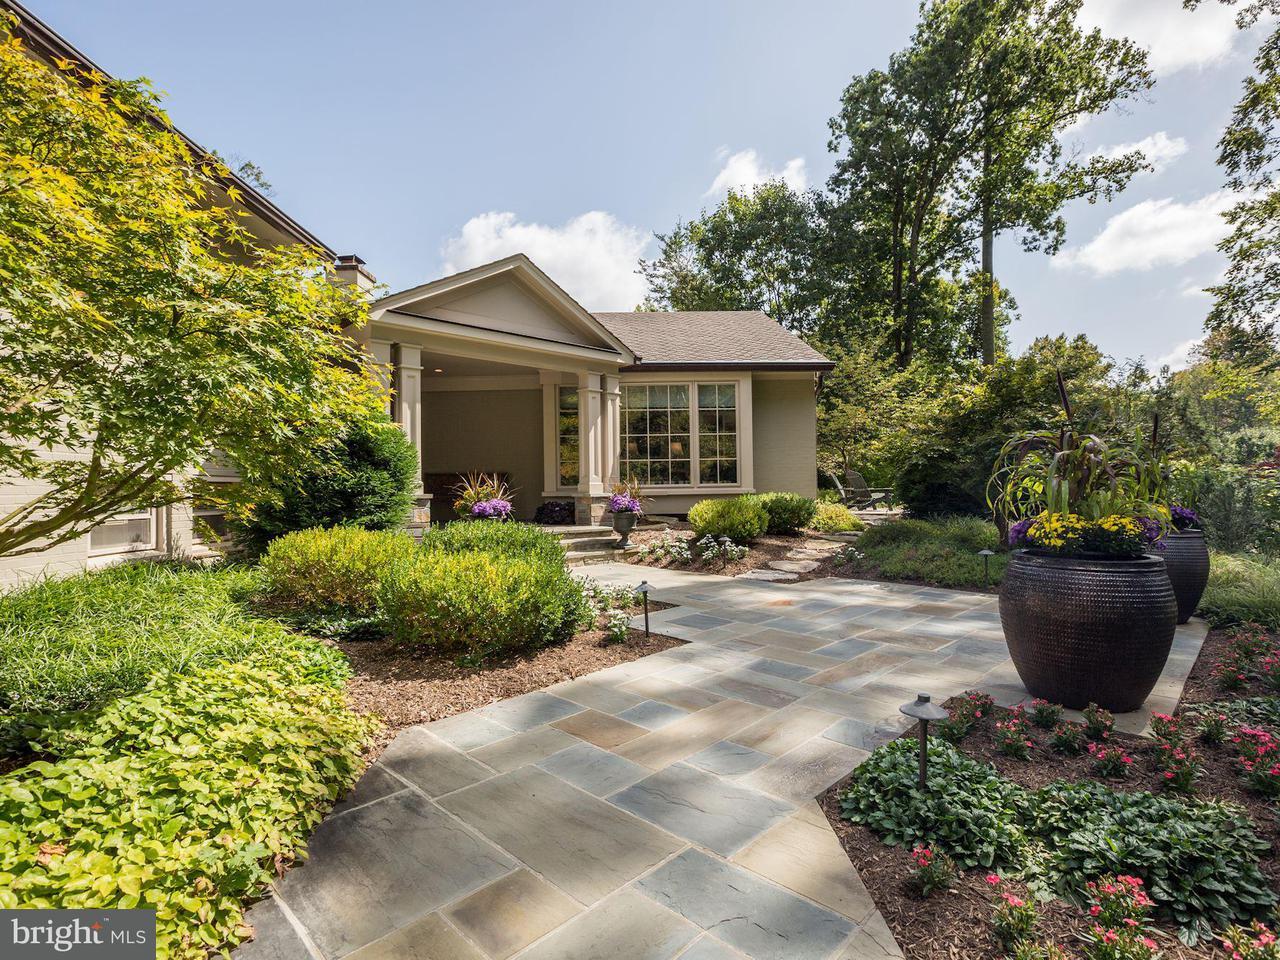 Single Family Home for Sale at 6407 Bradley Blvd 6407 Bradley Blvd Bethesda, Maryland 20817 United States